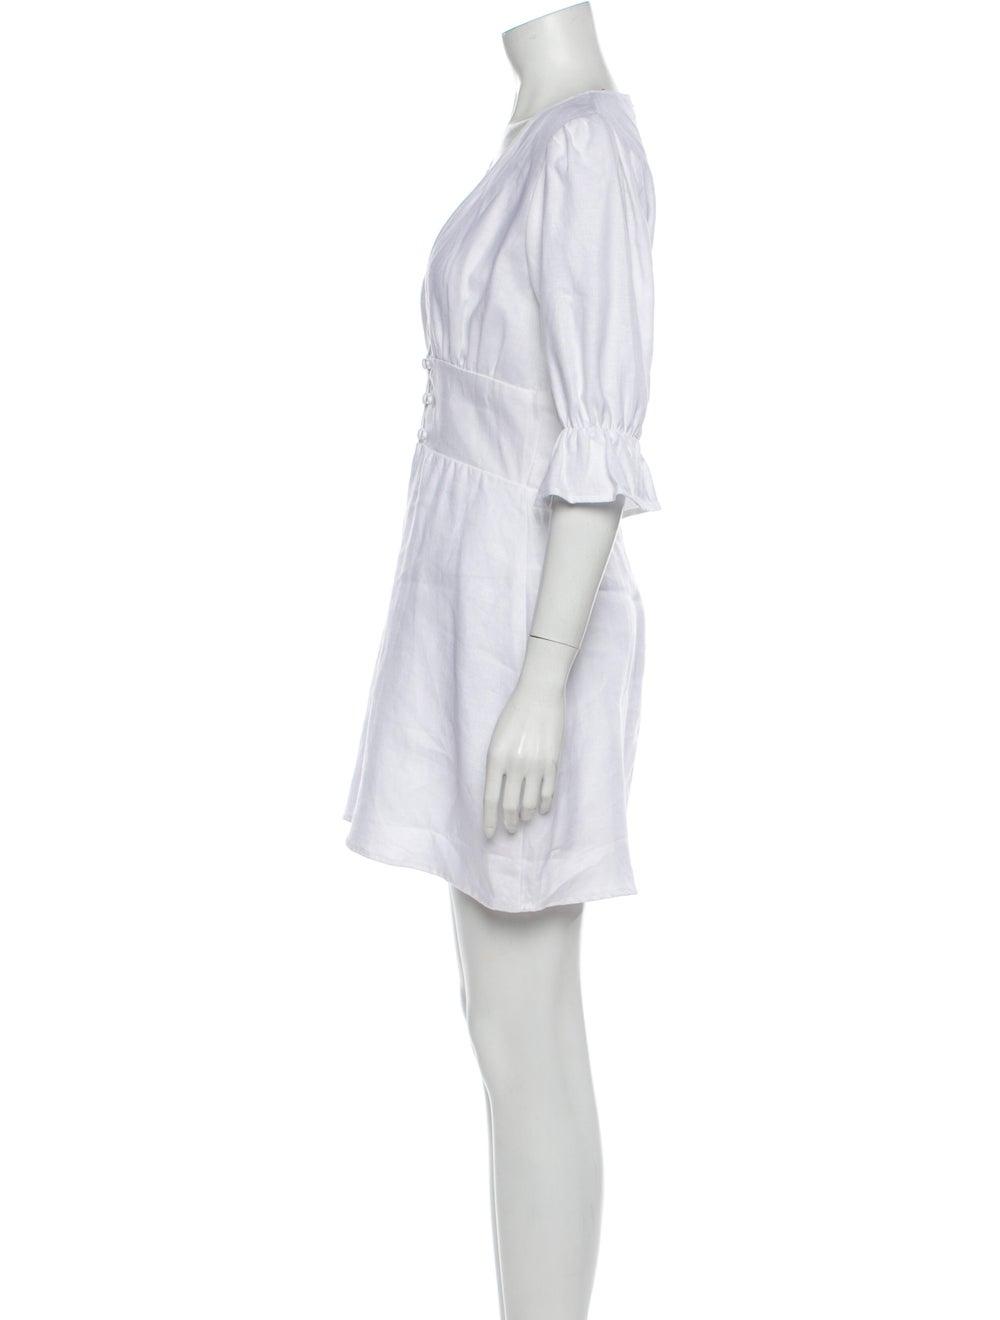 Reformation Linen Mini Dress White - image 2